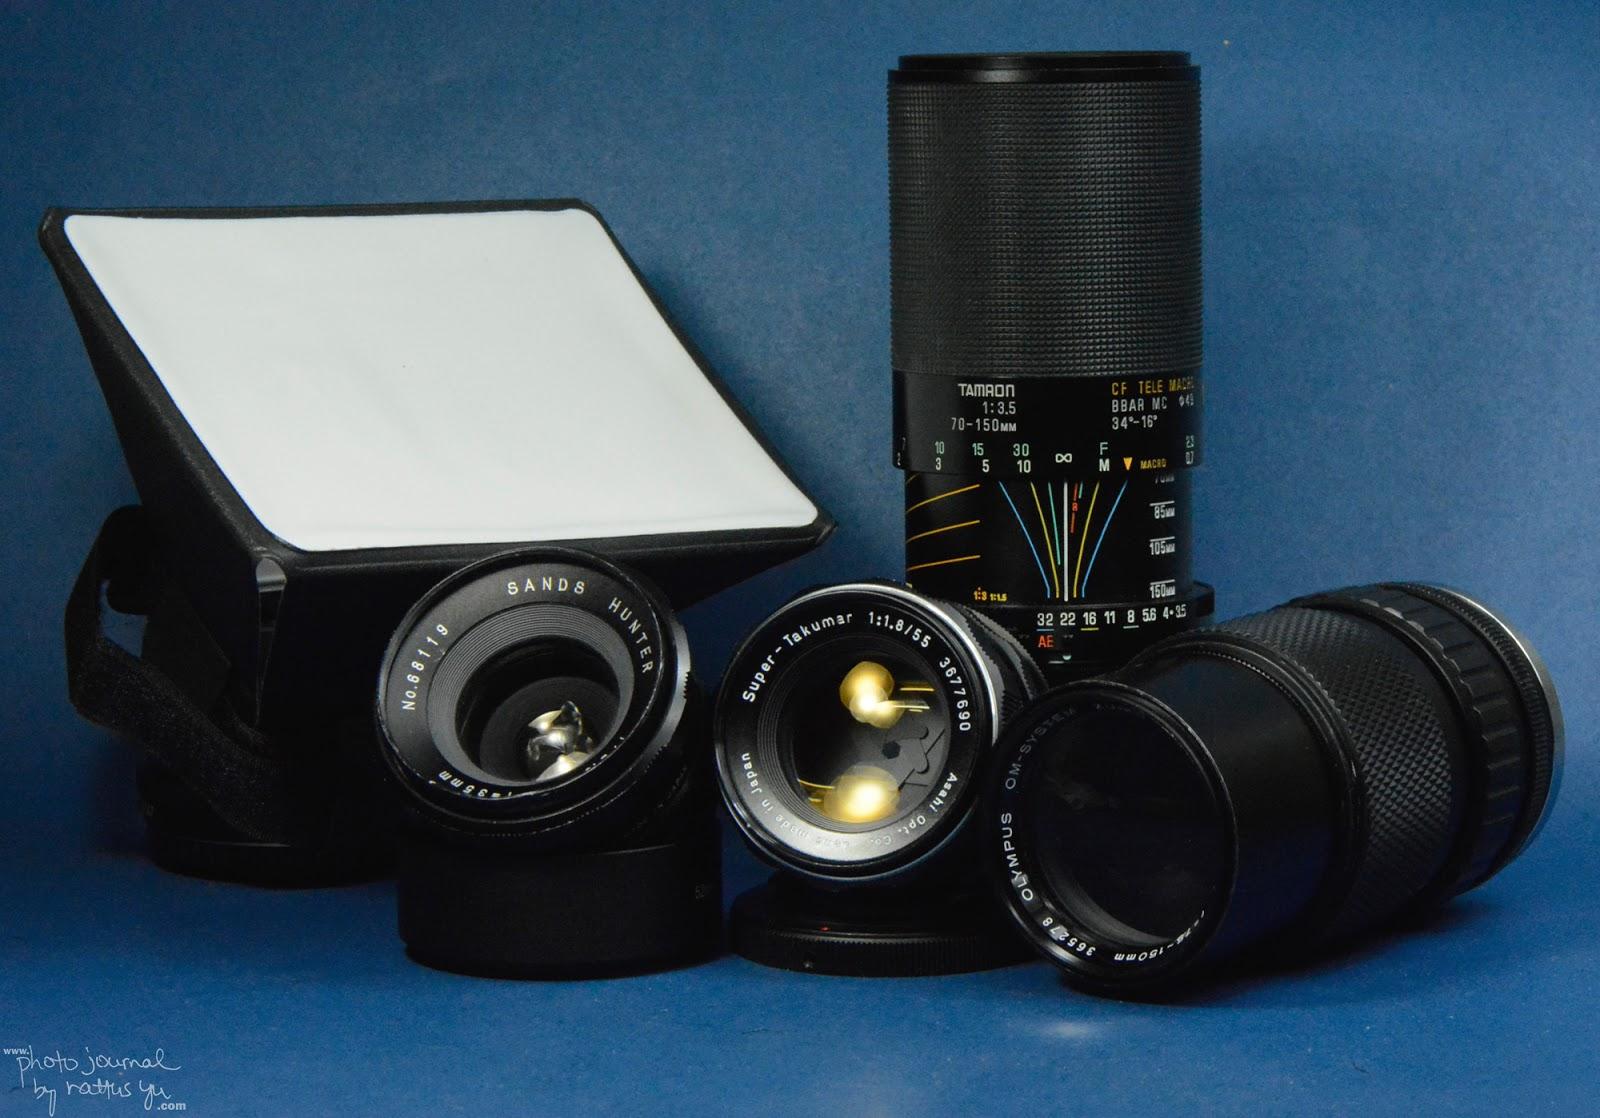 Vivitar 28-85mm f/2.8-3.8